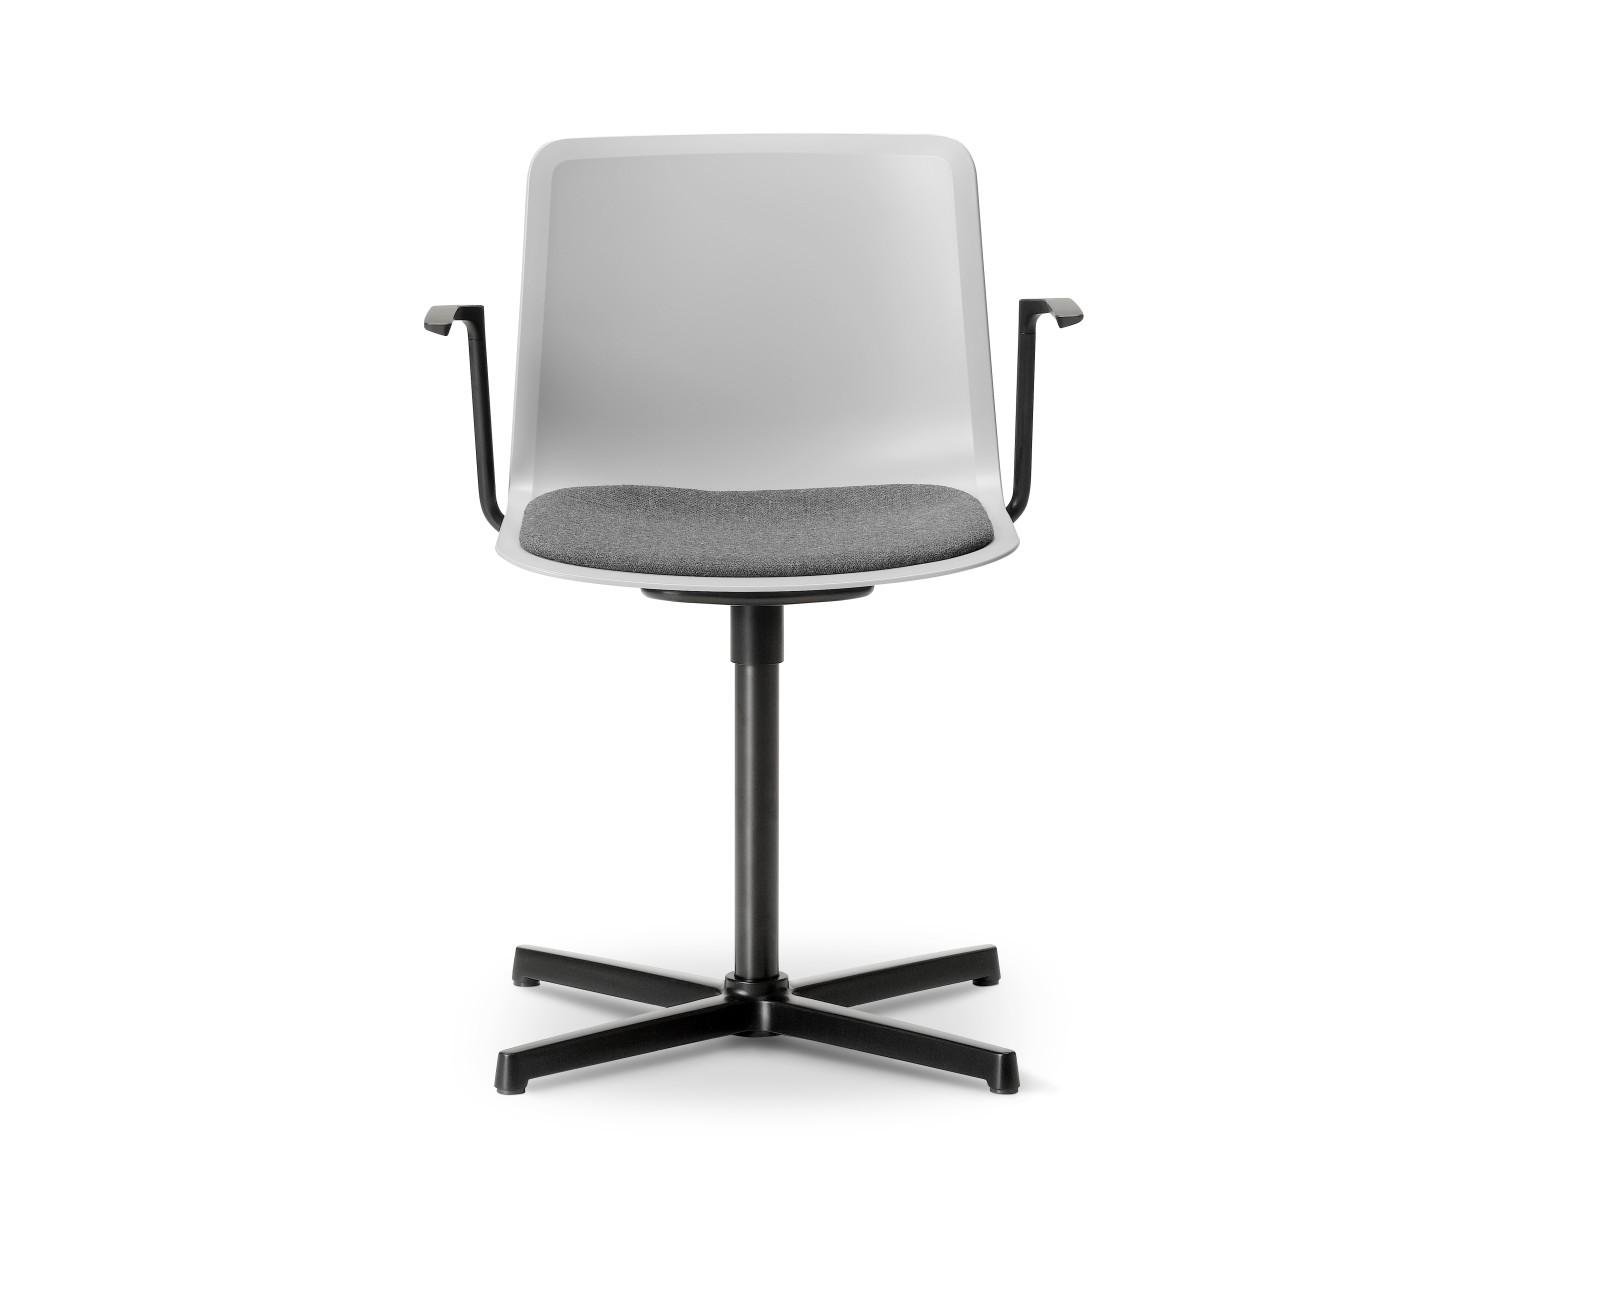 Pato Swivel Armchair with Seat Upholstery Chrome Steel, Quartz grey, Remix 2 143